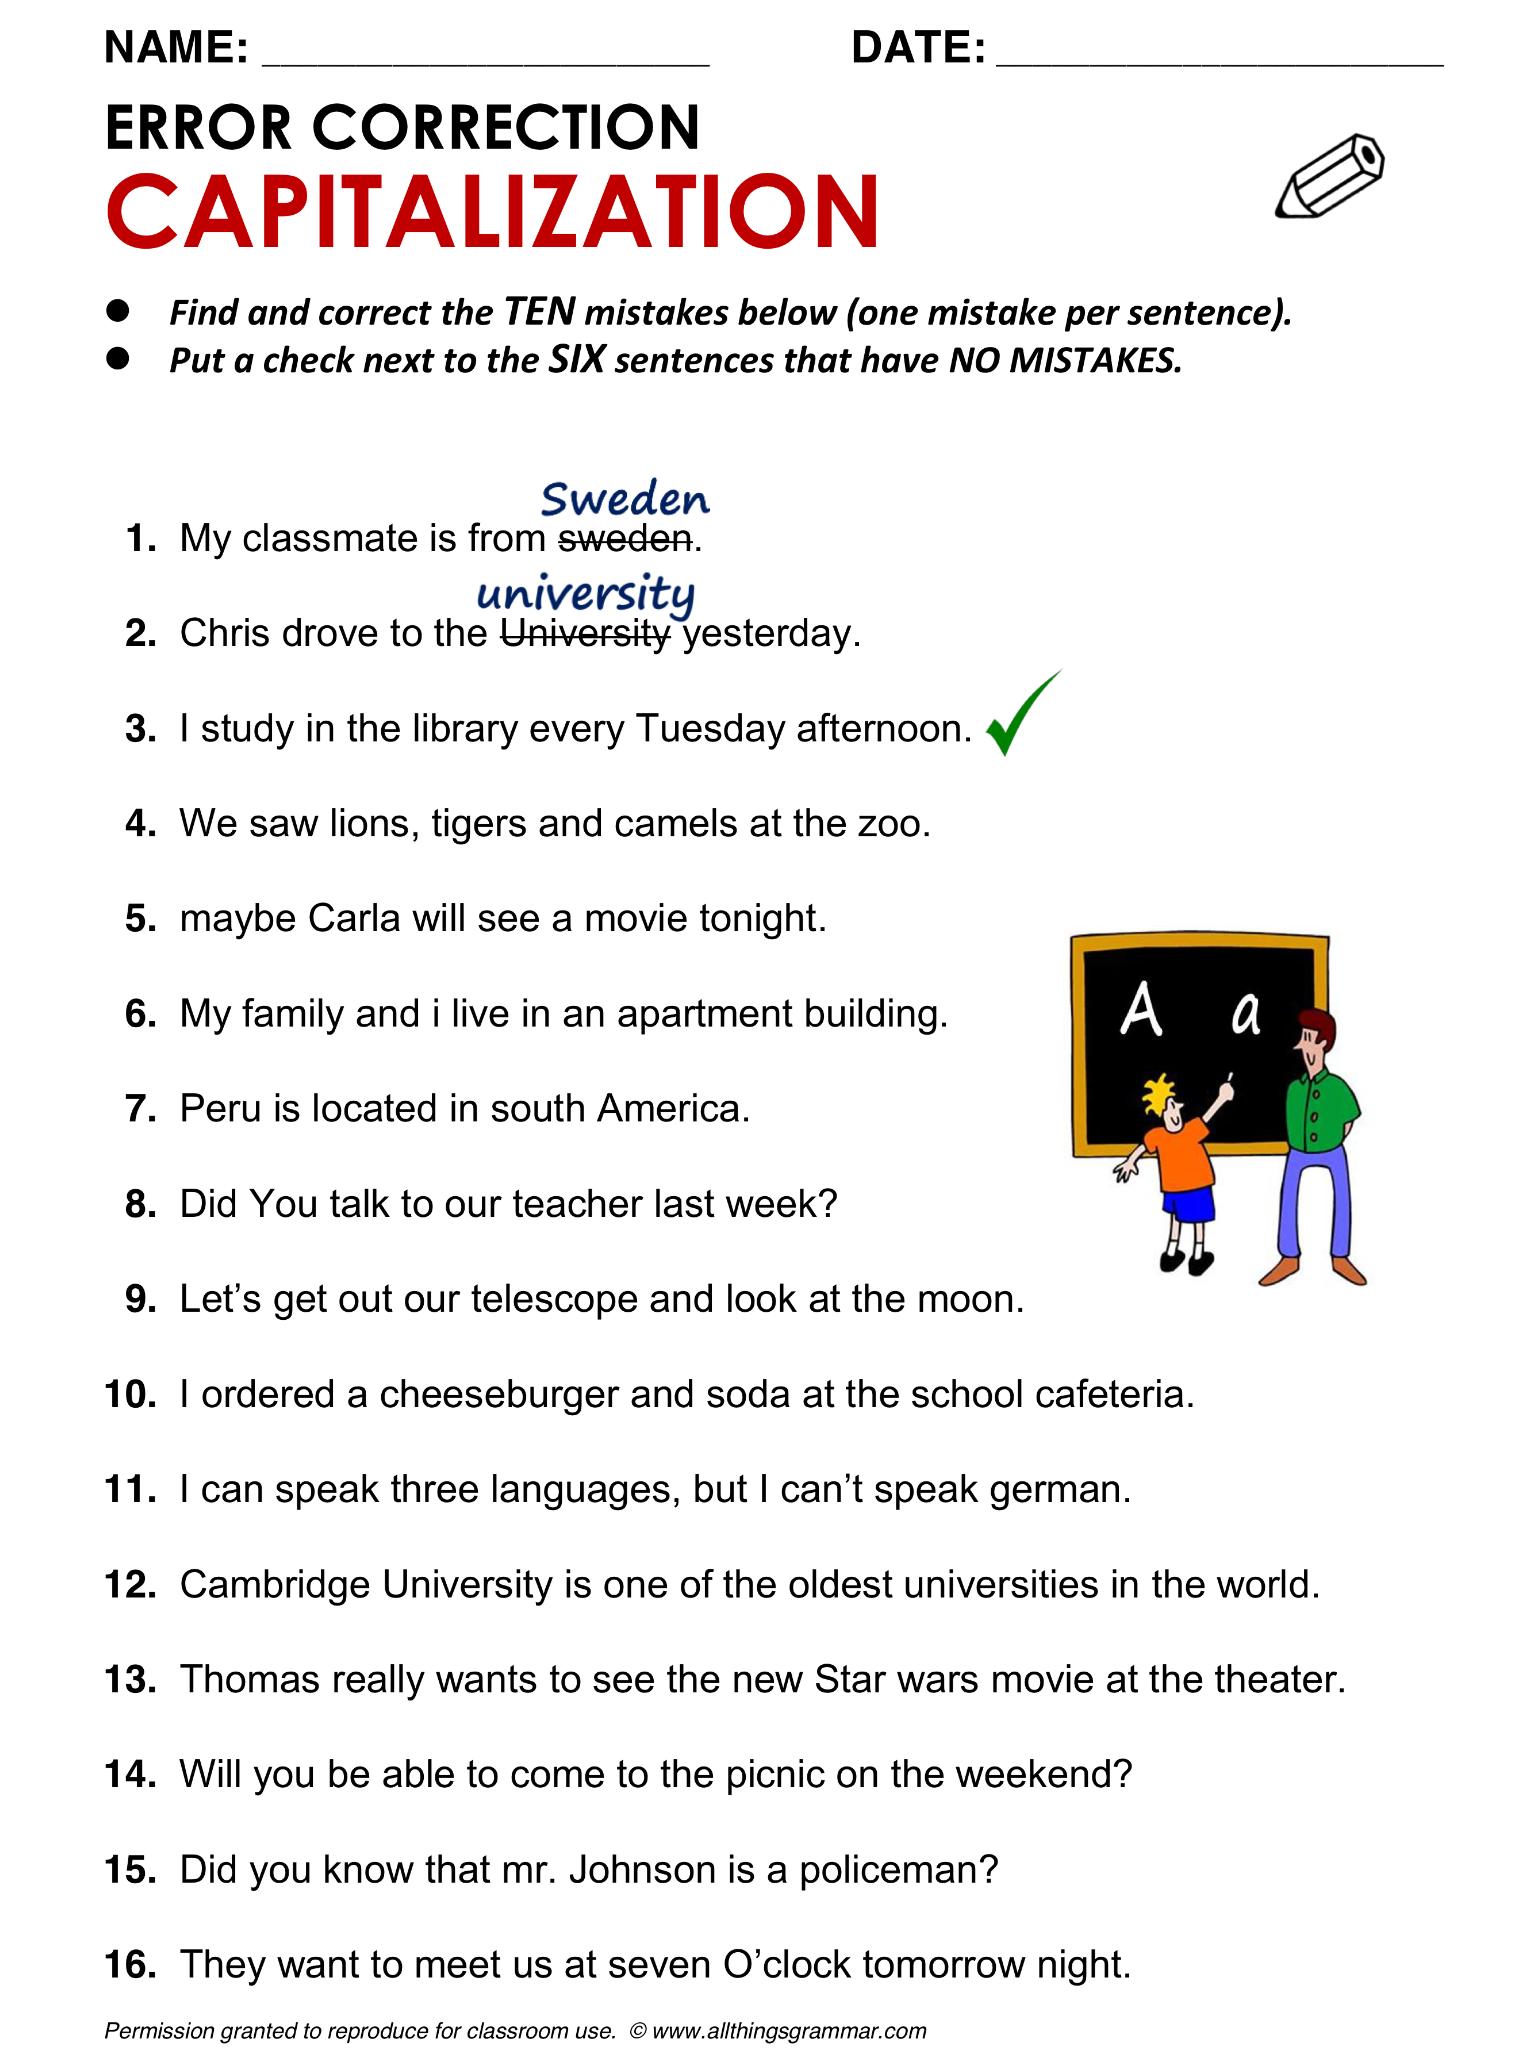 hight resolution of https://cute766.info/practice-capitalization-english-grammar-worksheets-grammar-worksheets-grammar-exercises/